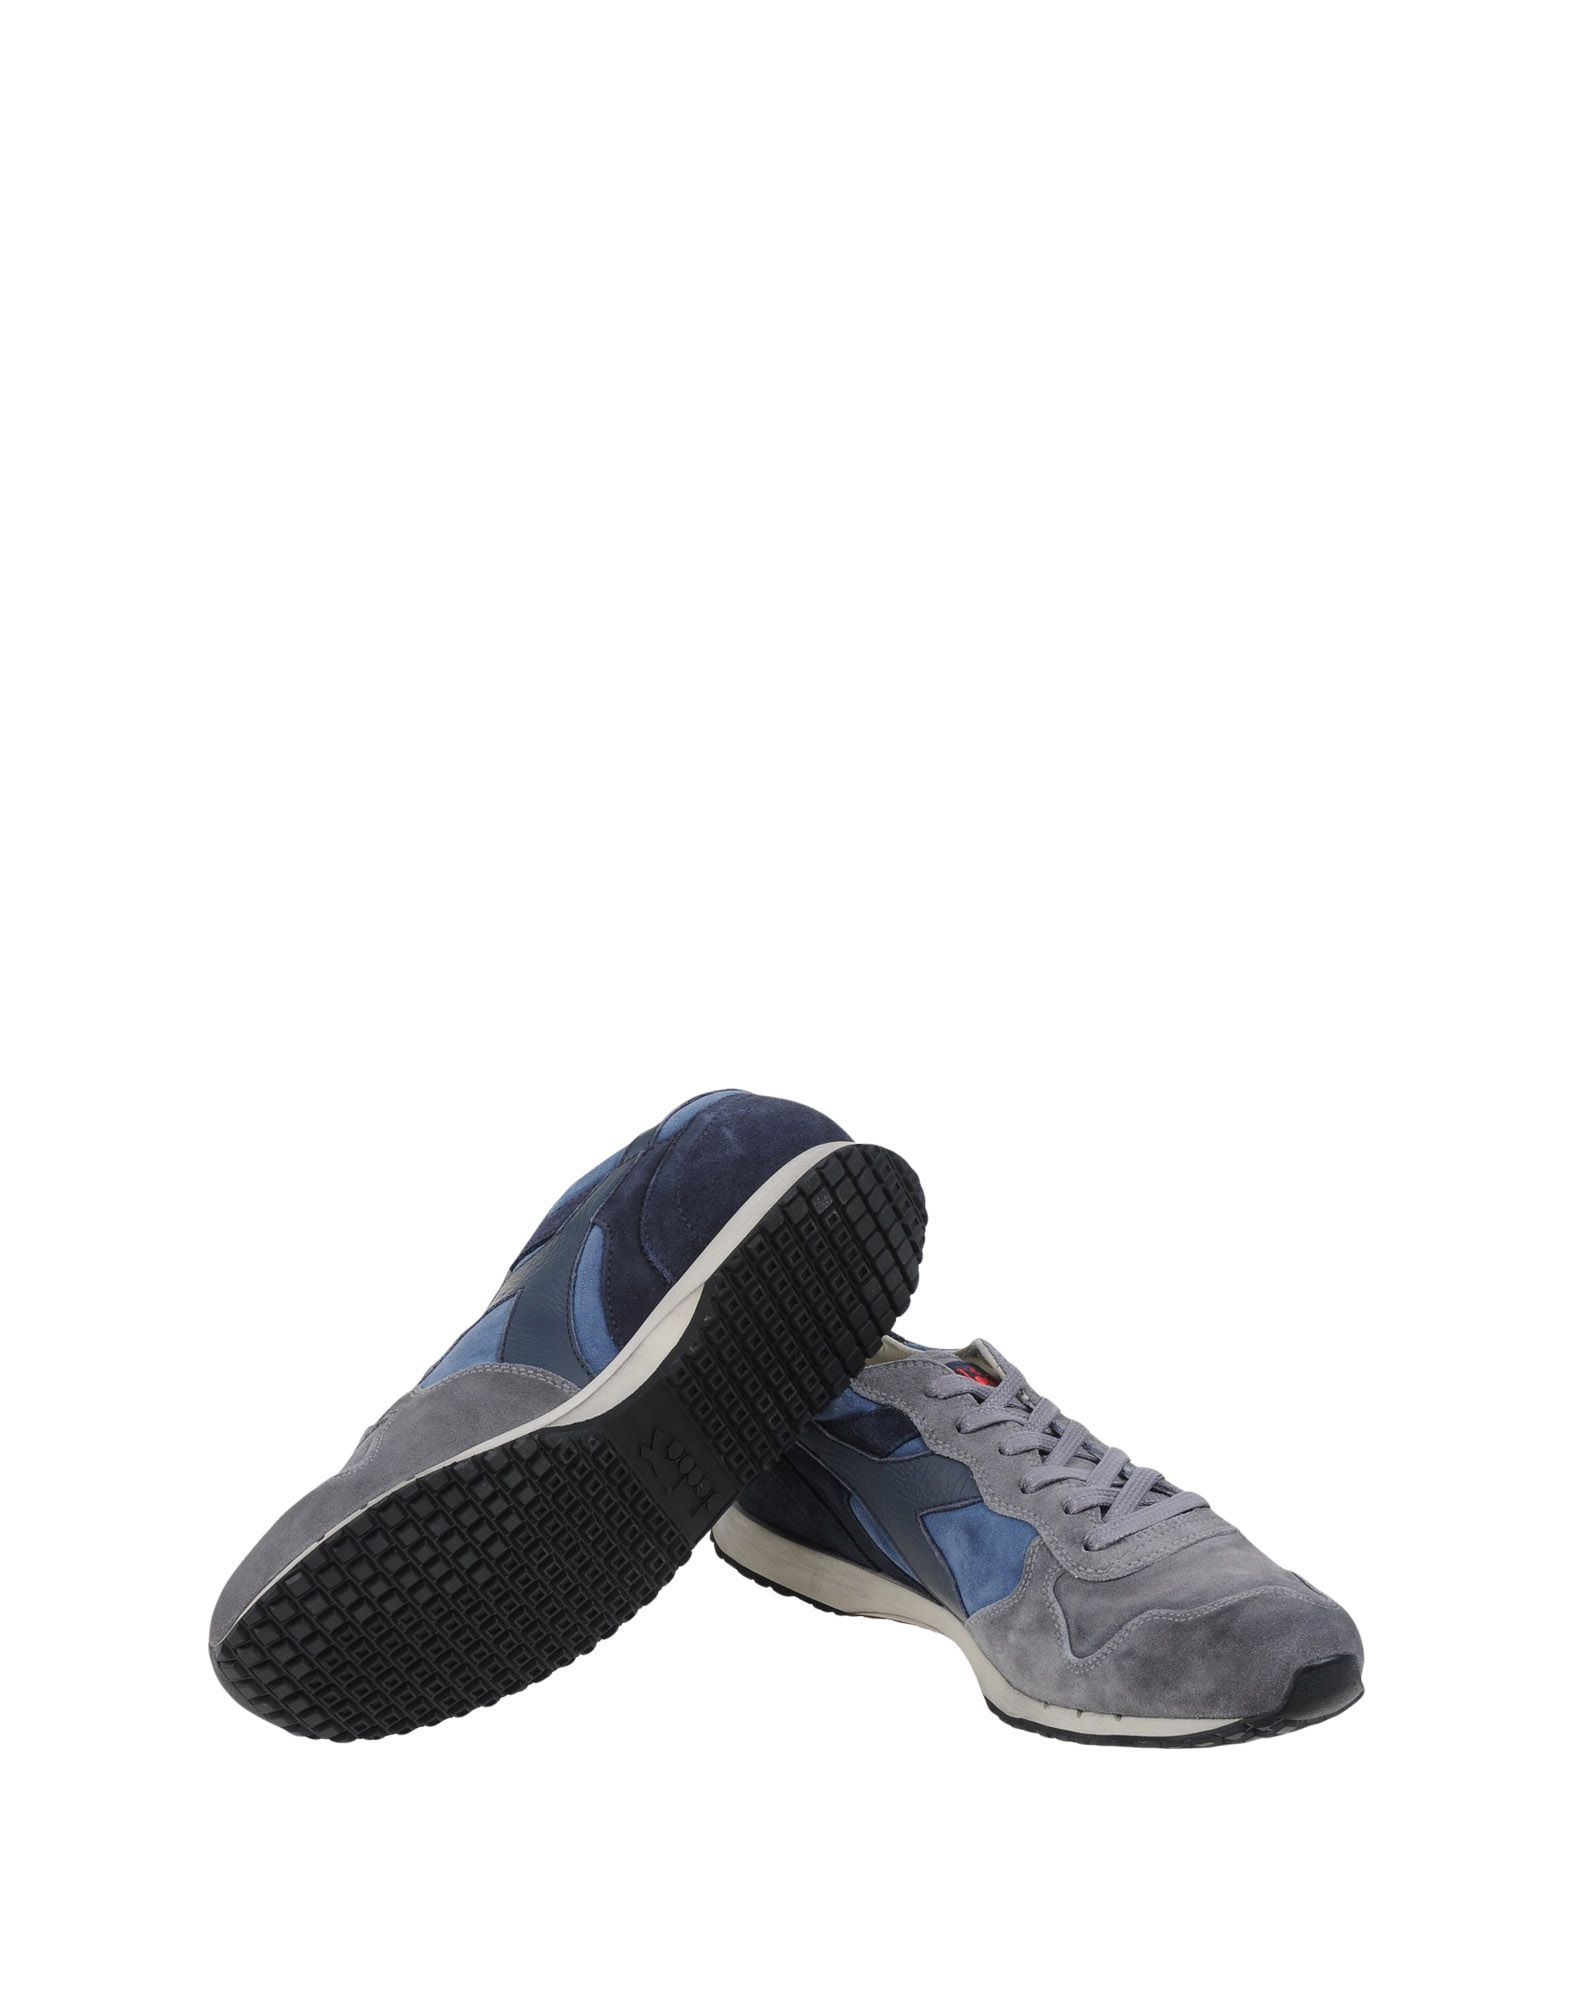 Diadora Heritage Trident S Schuhe Sw  11089587TO Neue Schuhe S 395adb